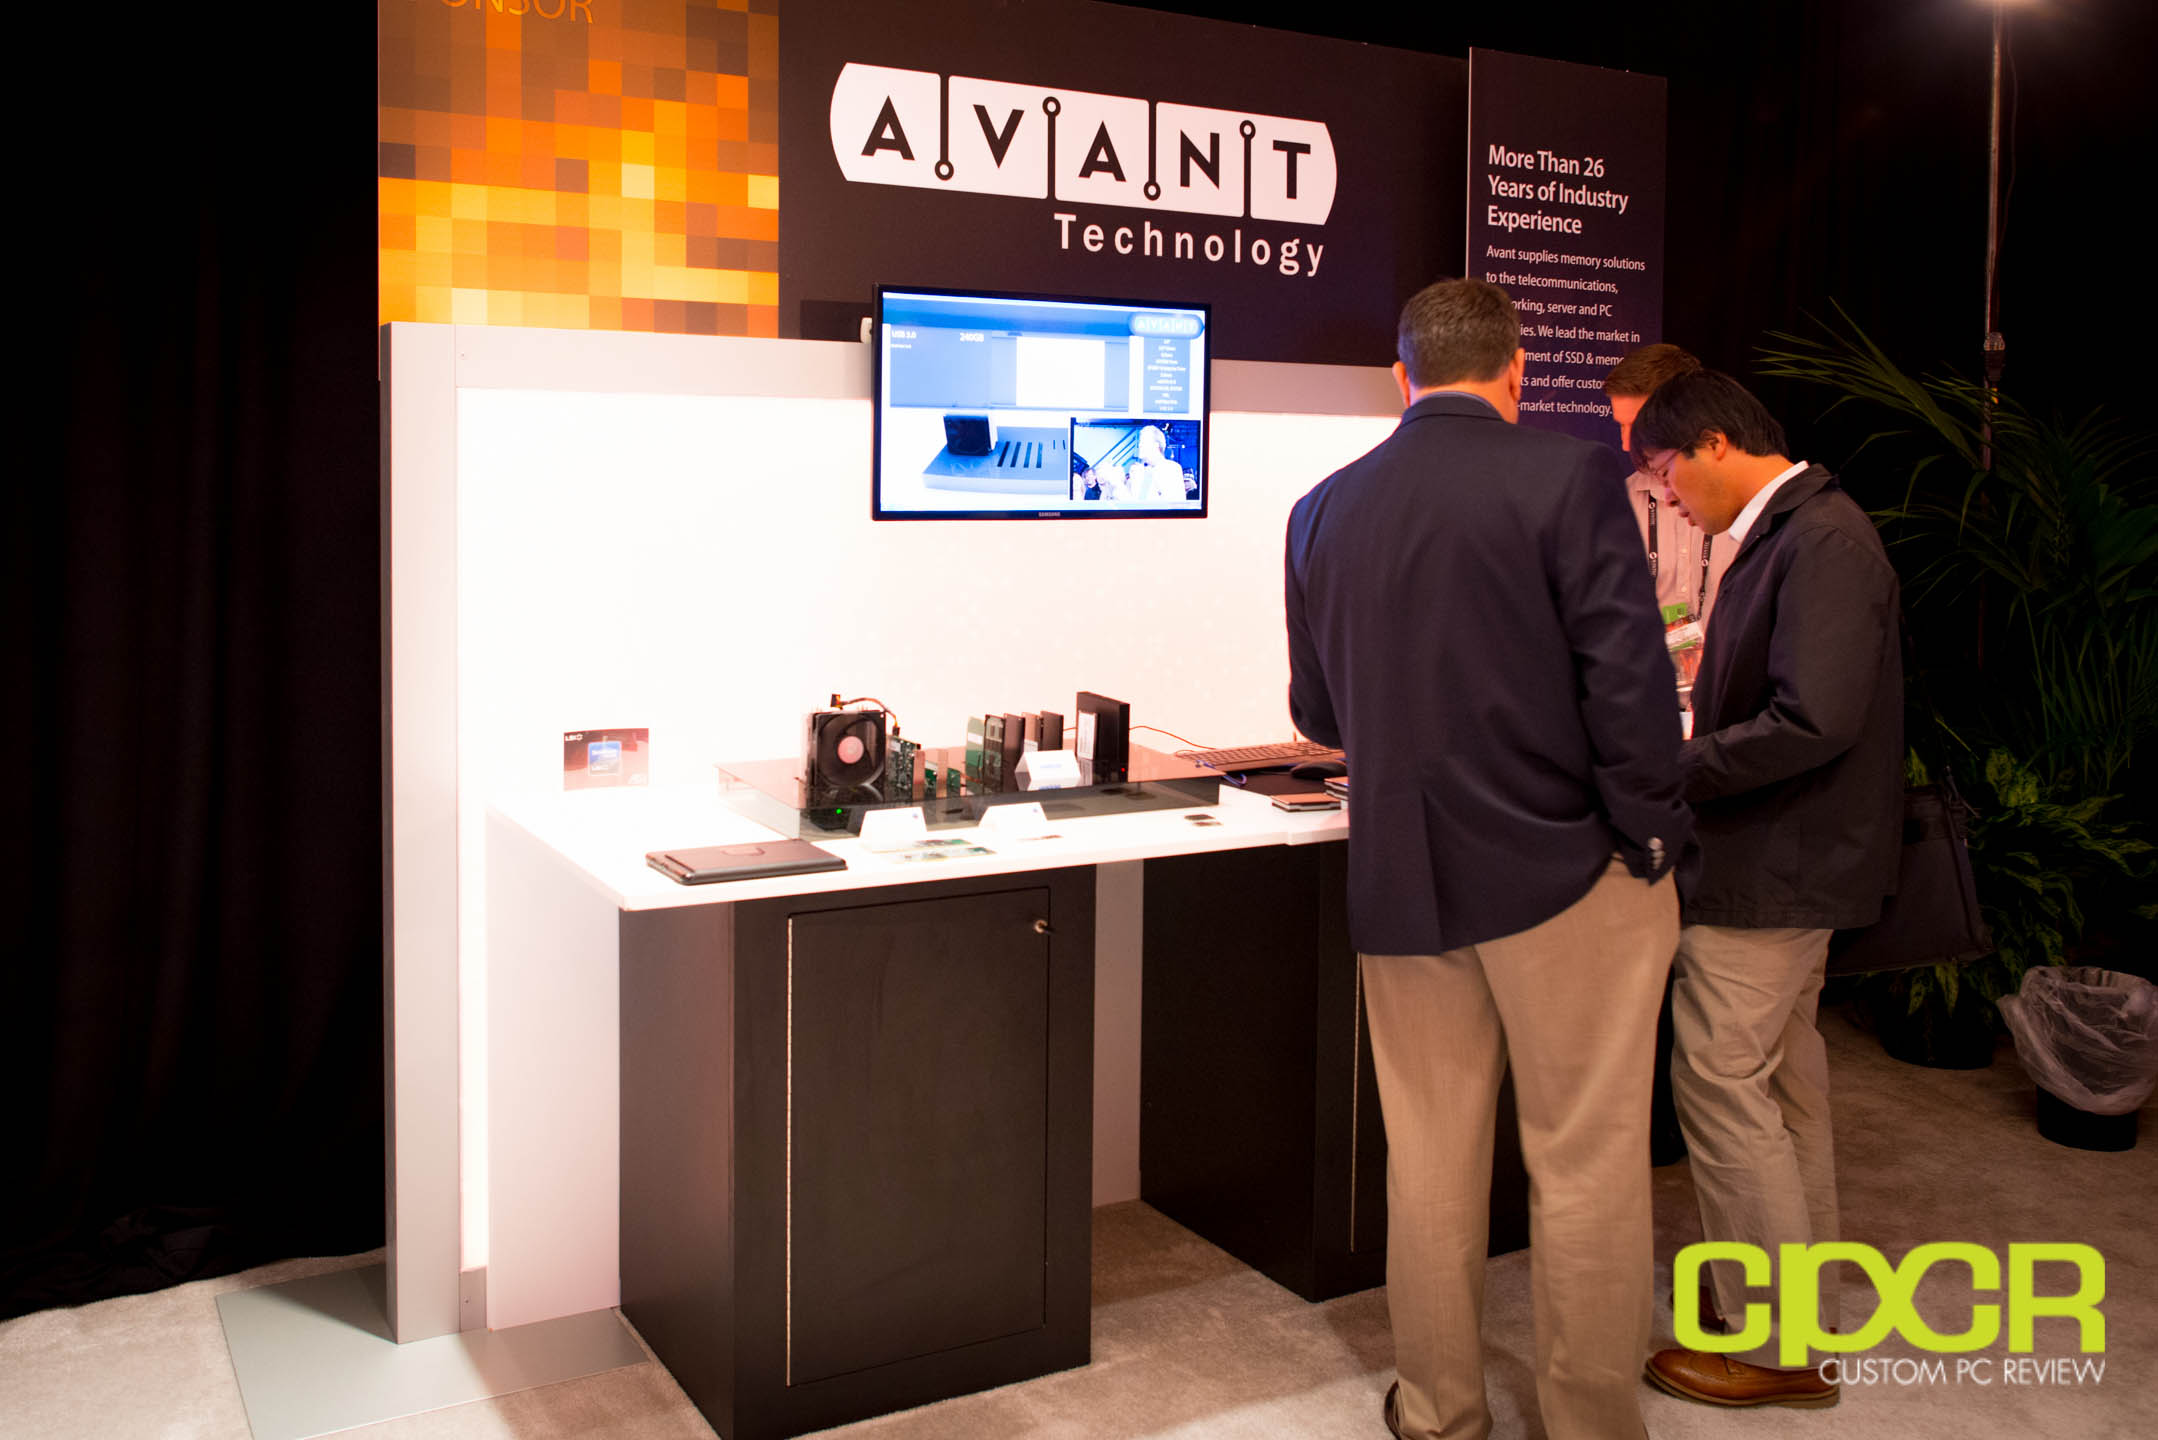 avant-technology-ais-2013-custom-pc-review-9